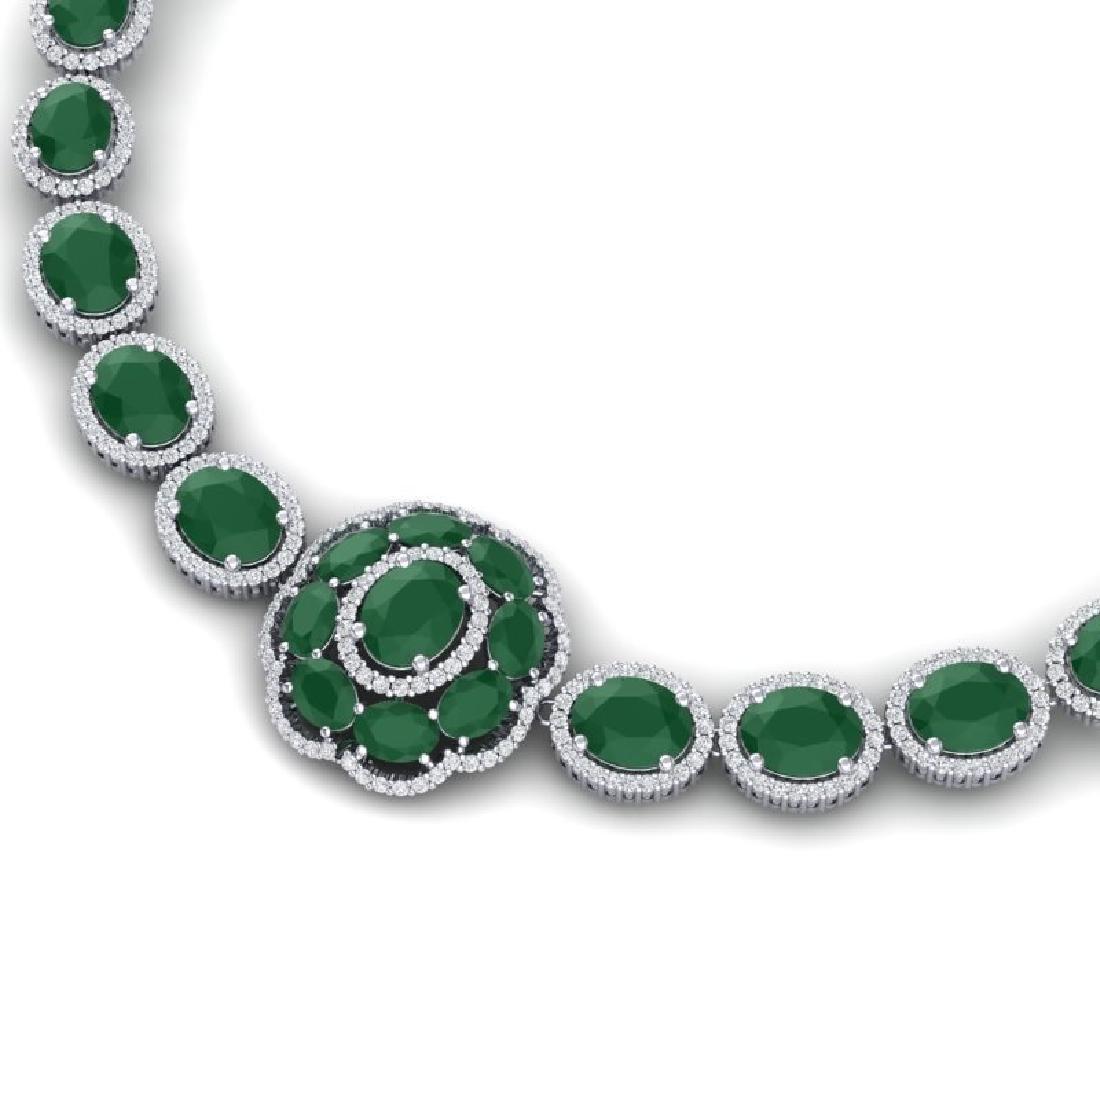 58.33 CTW Royalty Emerald & VS Diamond Necklace 18K